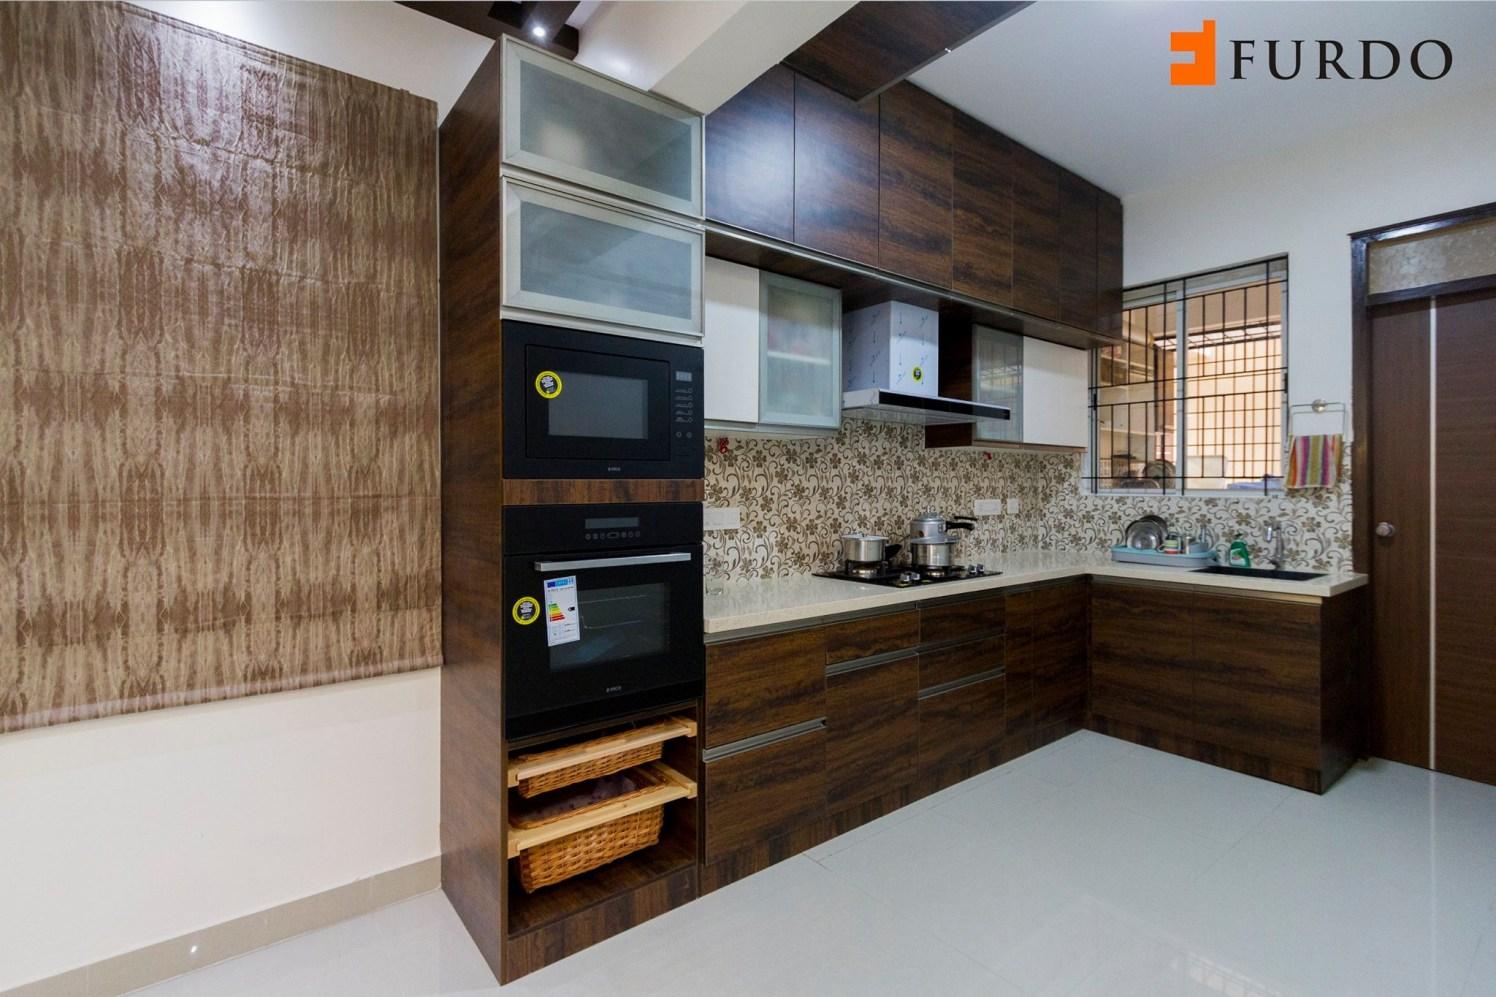 Kitchen With Modular Cabinets by Furdo.com Modular-kitchen Modern | Interior Design Photos & Ideas